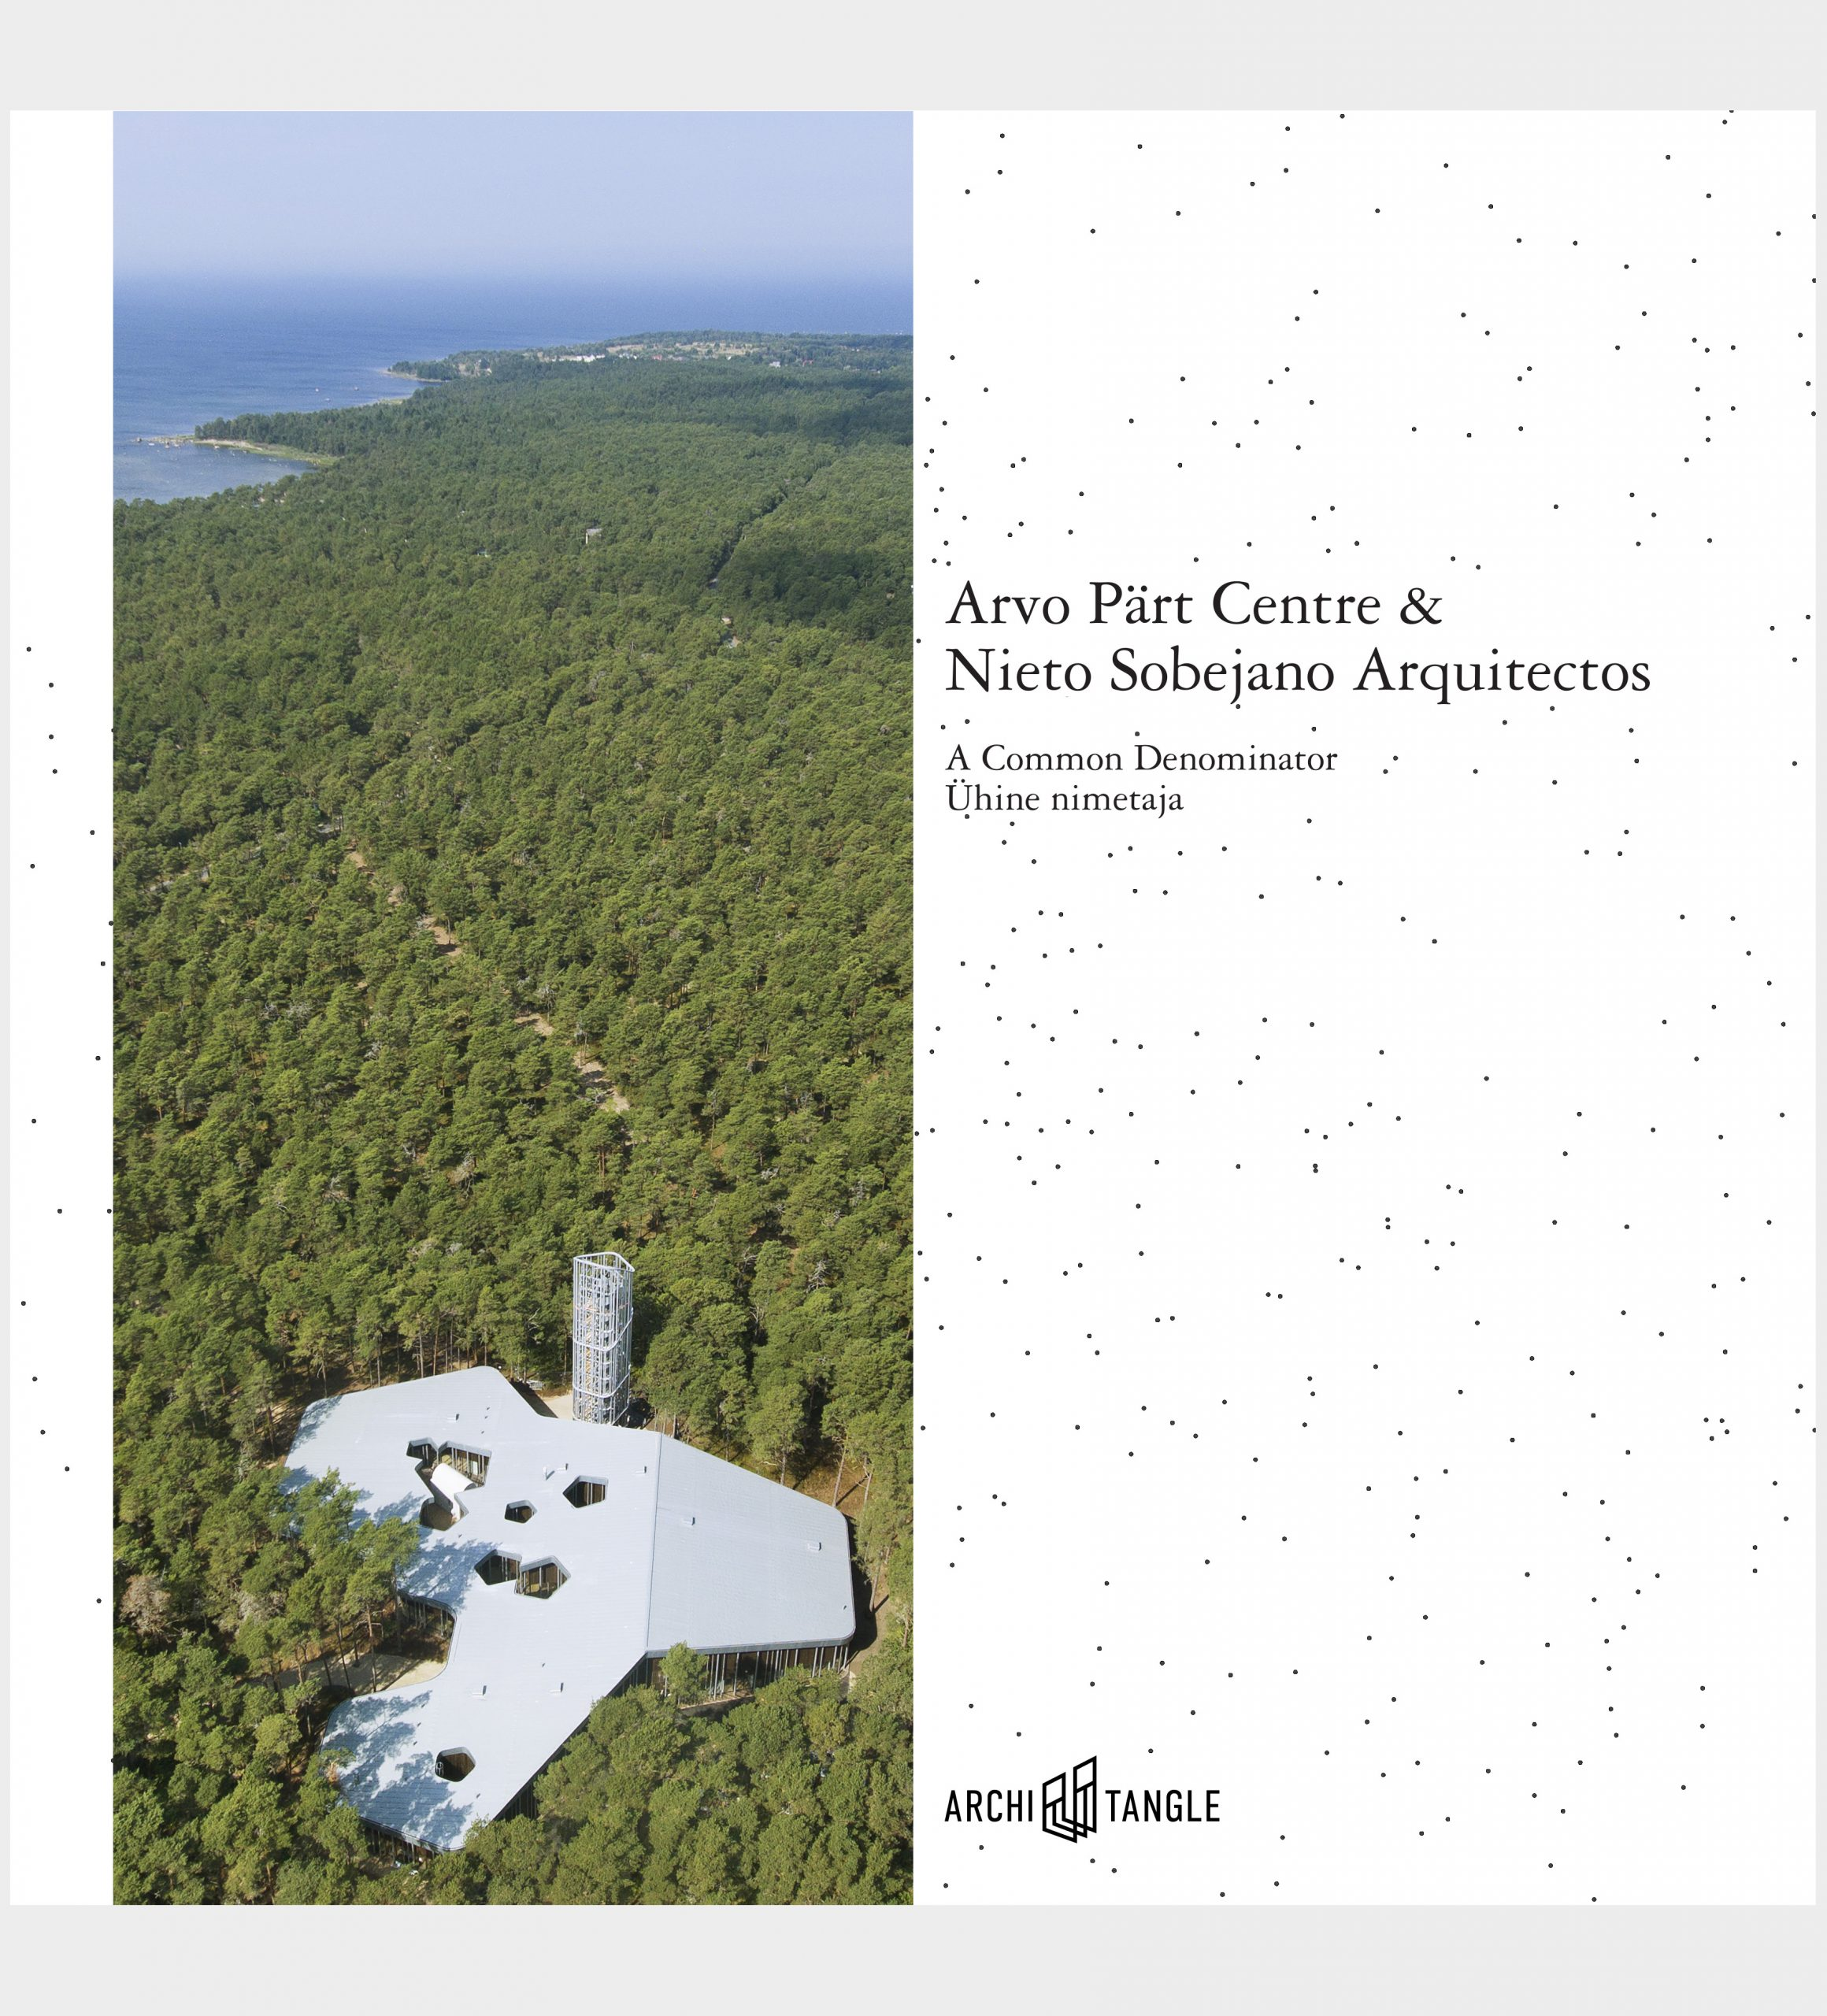 Arvo Pärt Centre & Nieto Sobejano Arquitectos – A Common Denominator